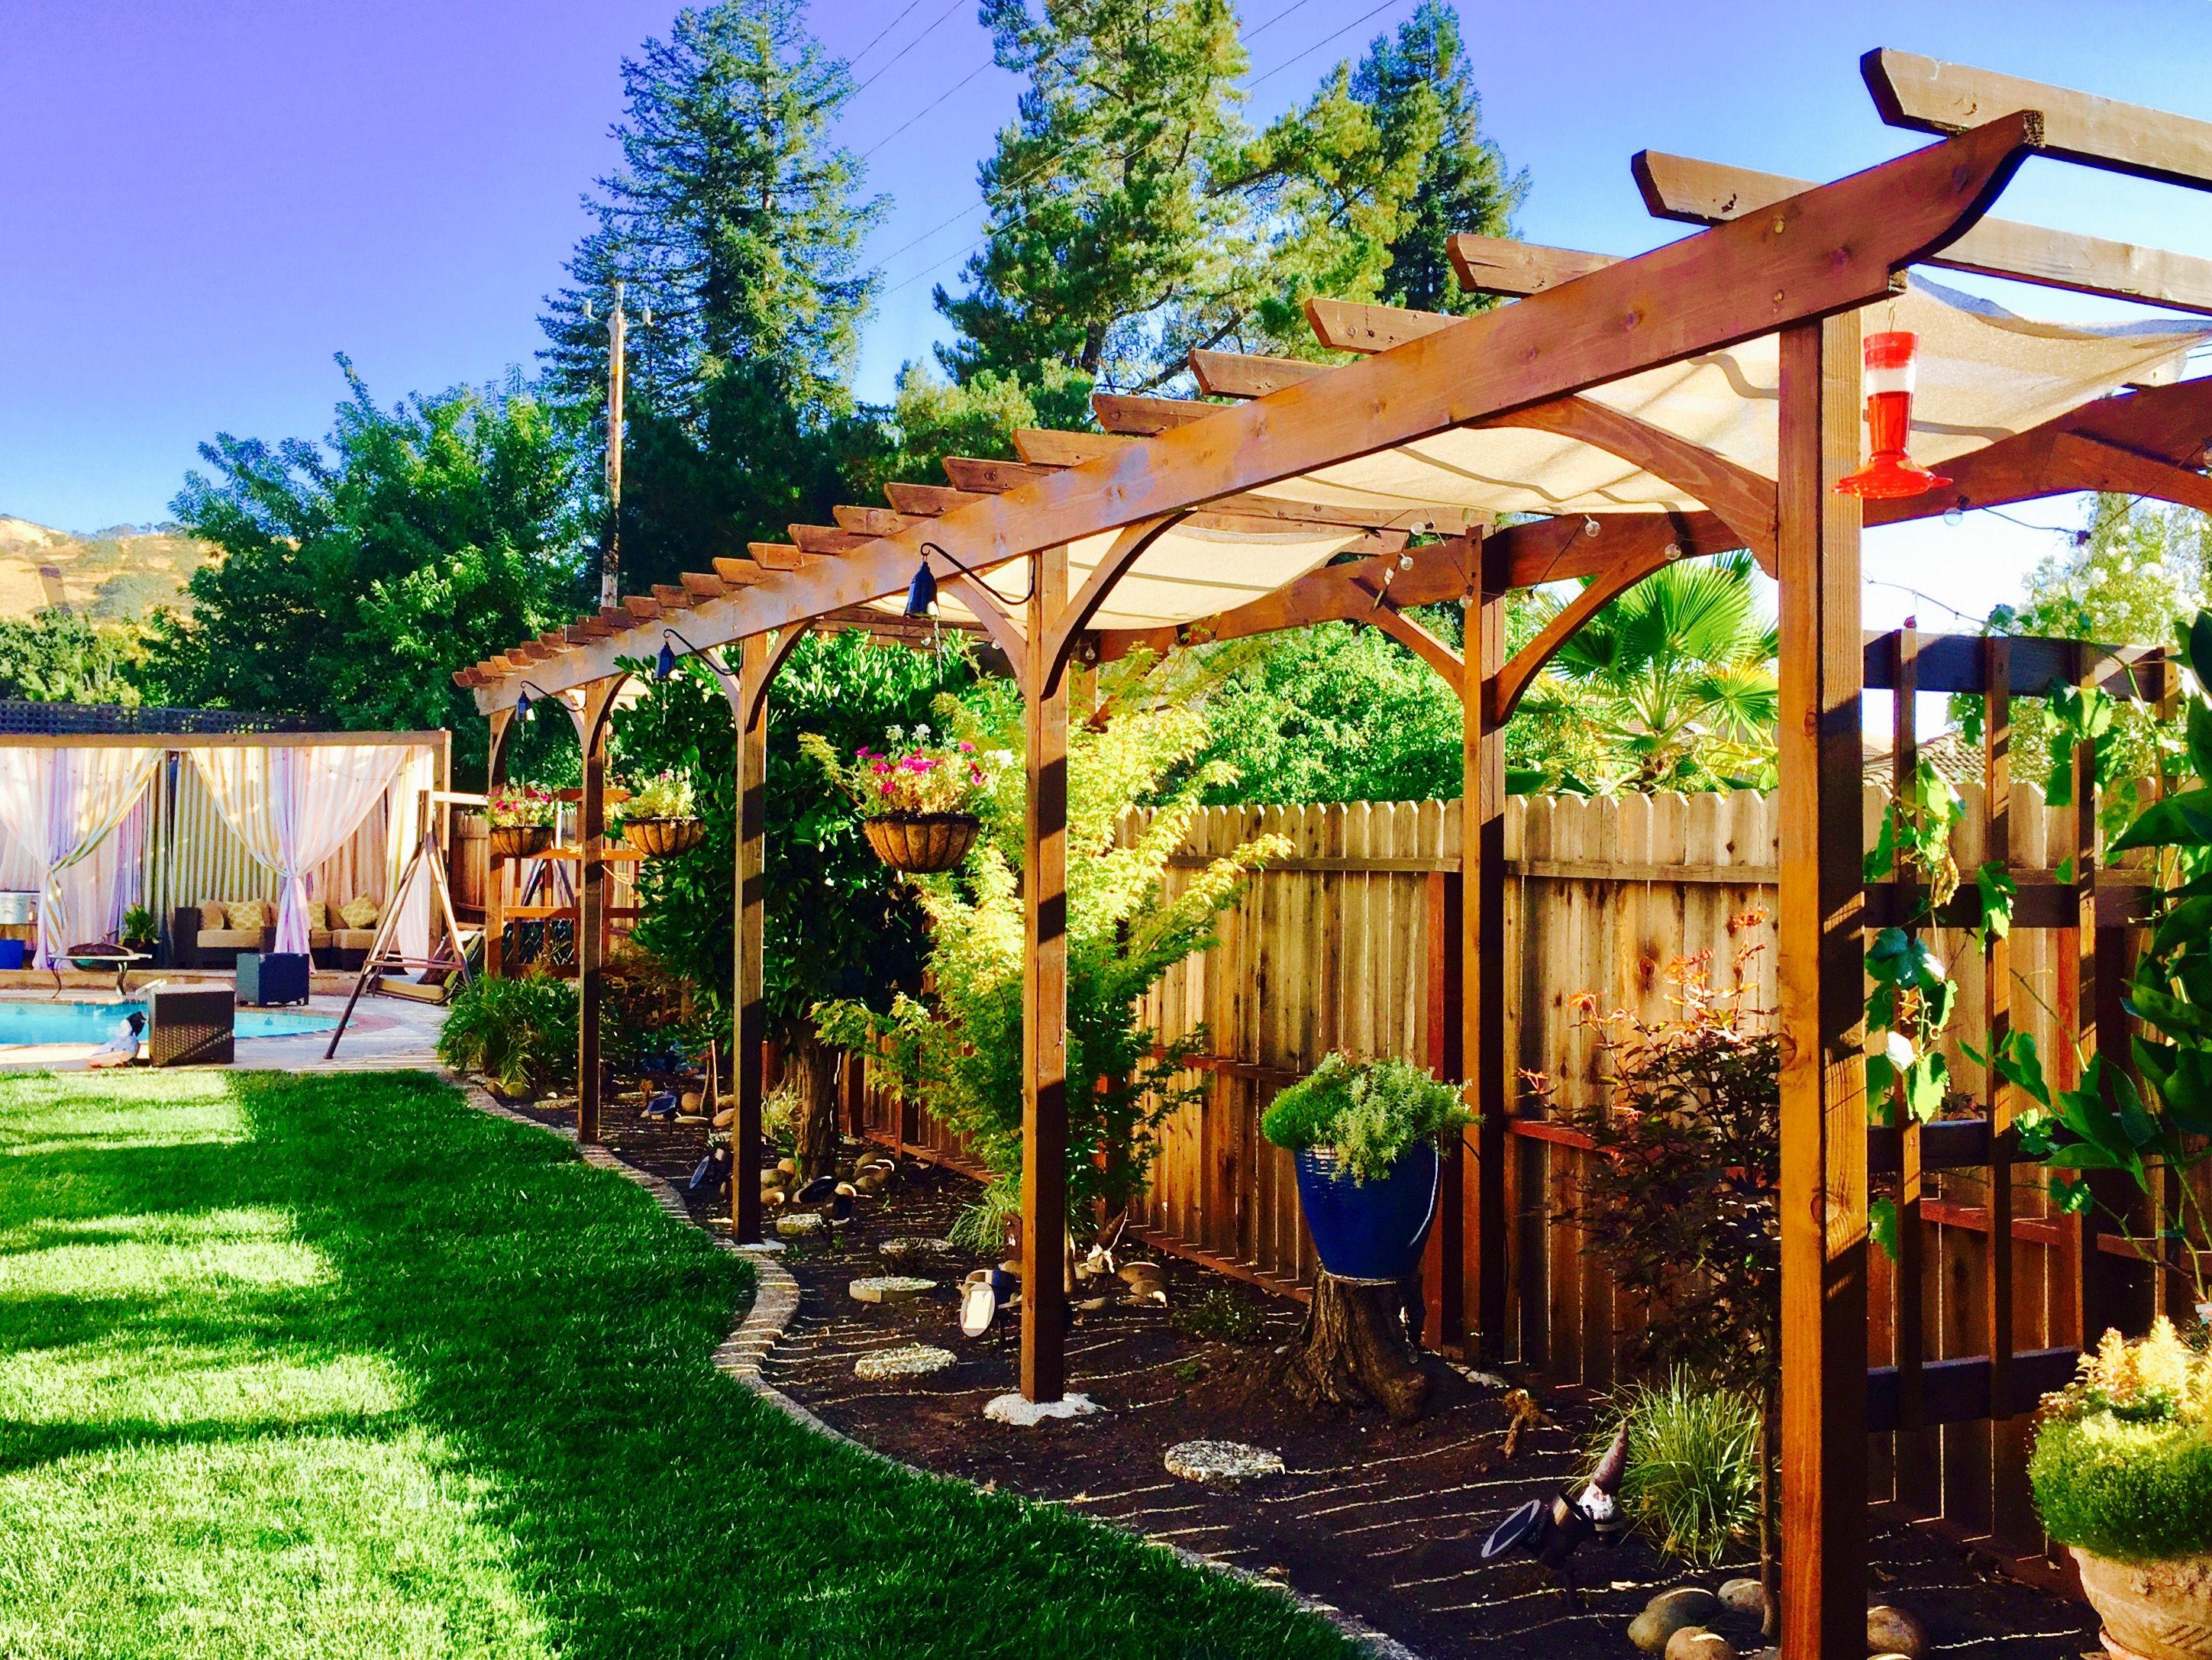 Arbor, Trellis, Pool, Cabana, Japanese Maple, Hanging Pots